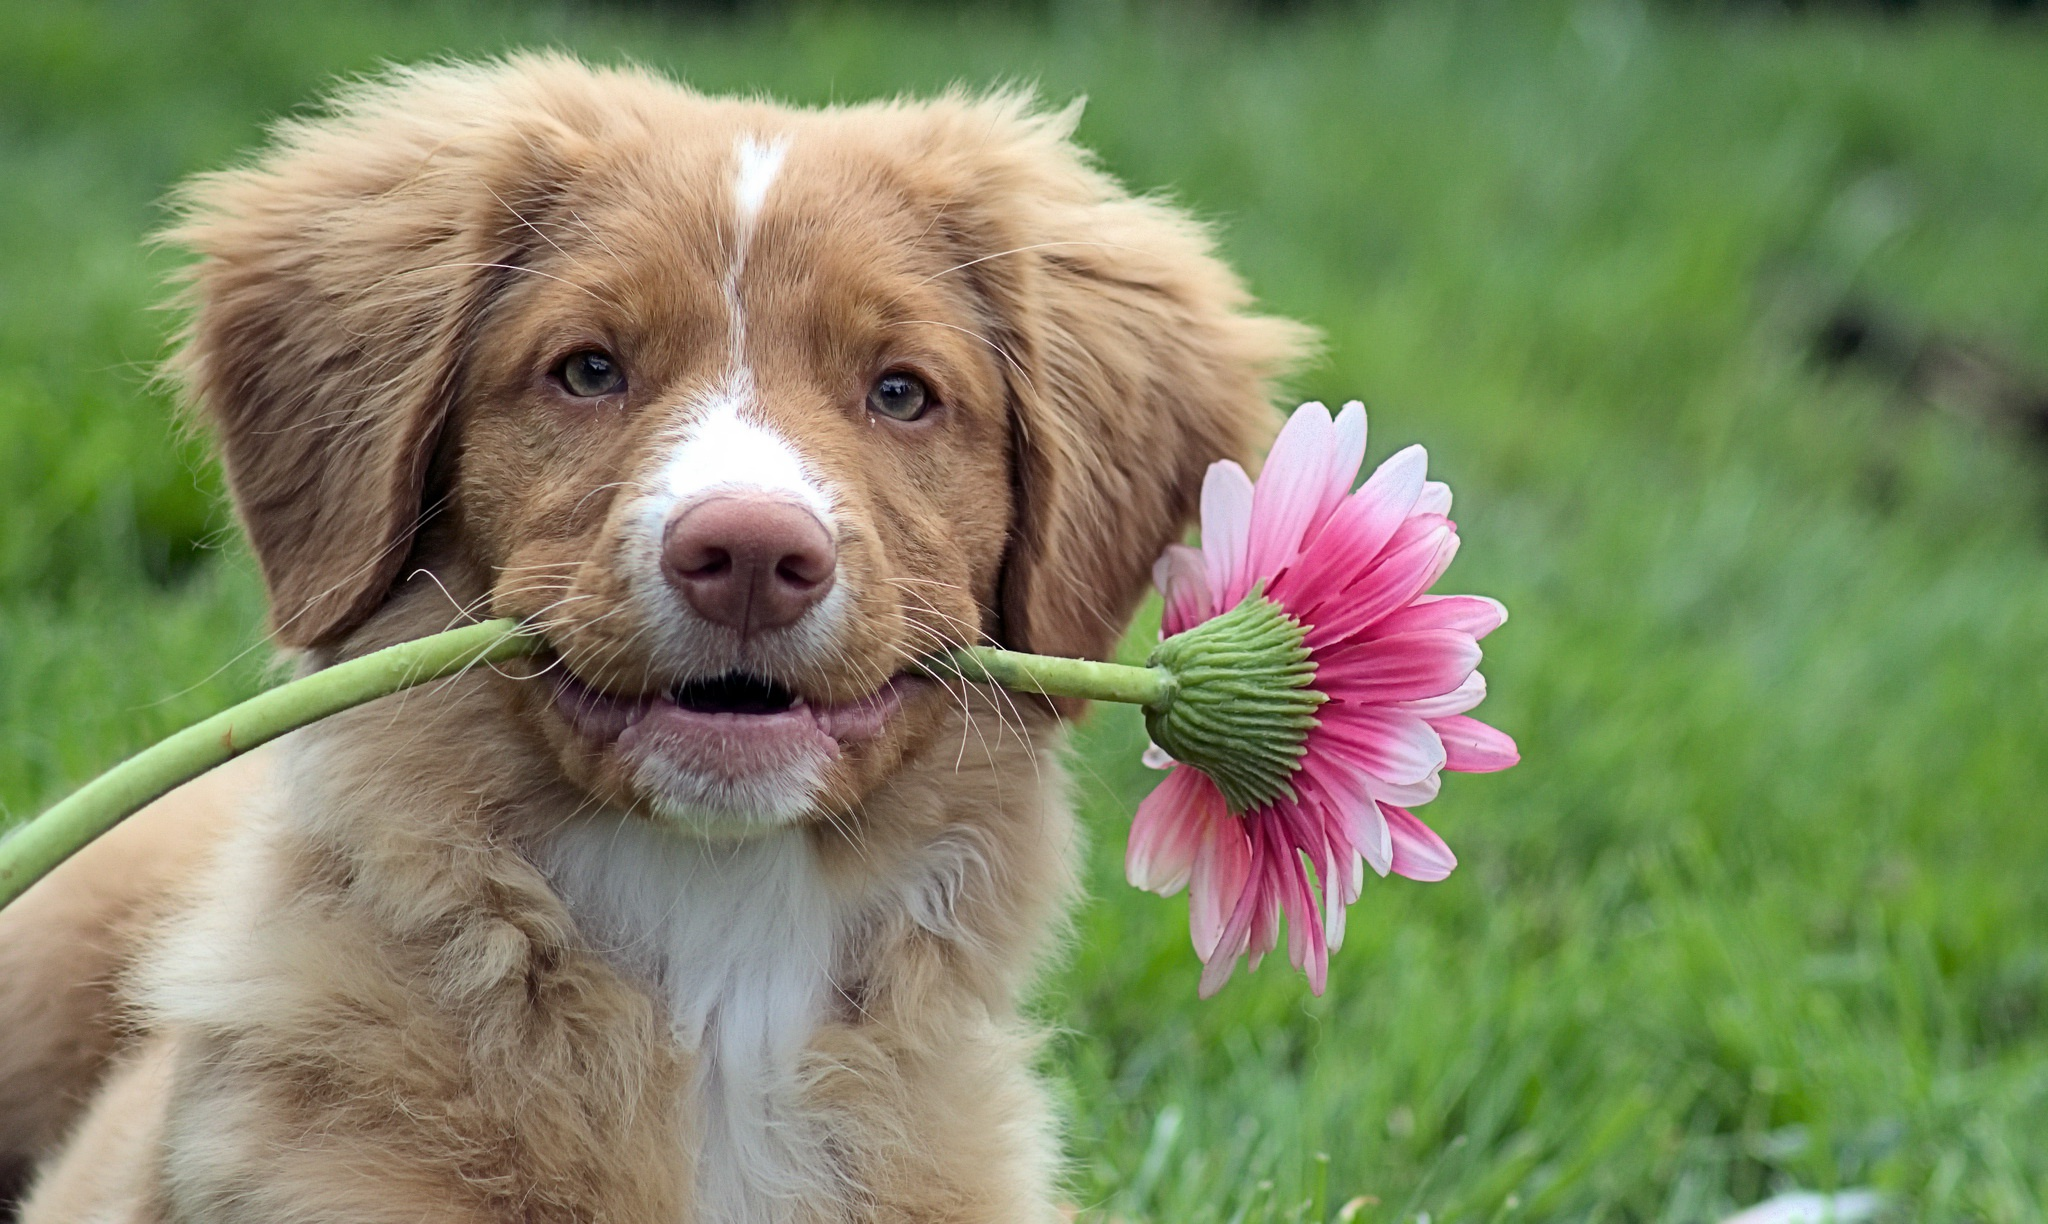 Картинки животных с цветами в зубах фото, ретро победа картинки